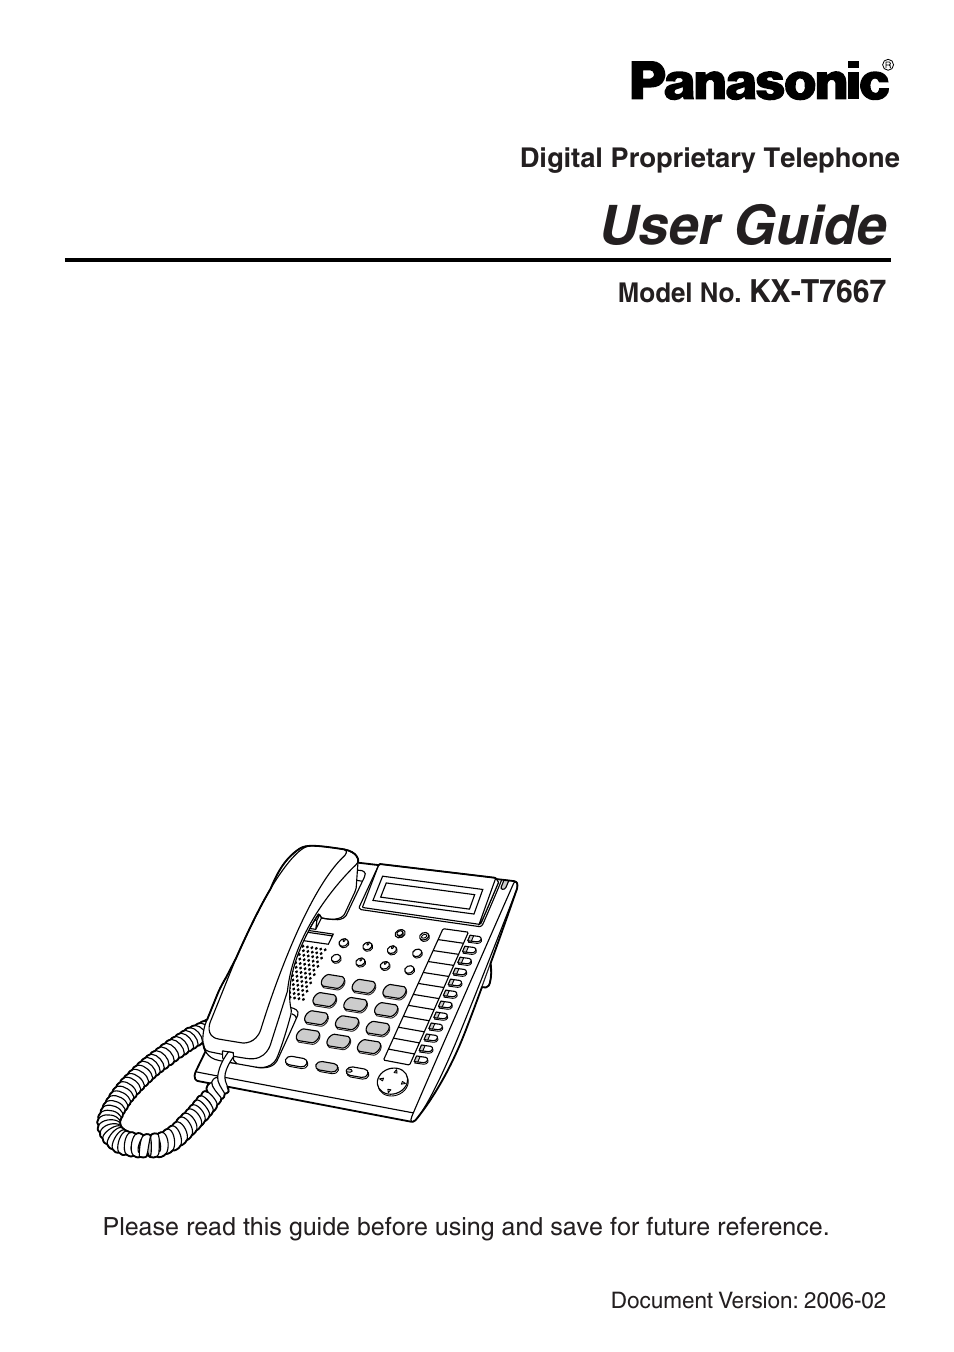 panasonic kx t7667 user manual 10 pages rh manualsdir com kx-t7667 user manual Example User Guide